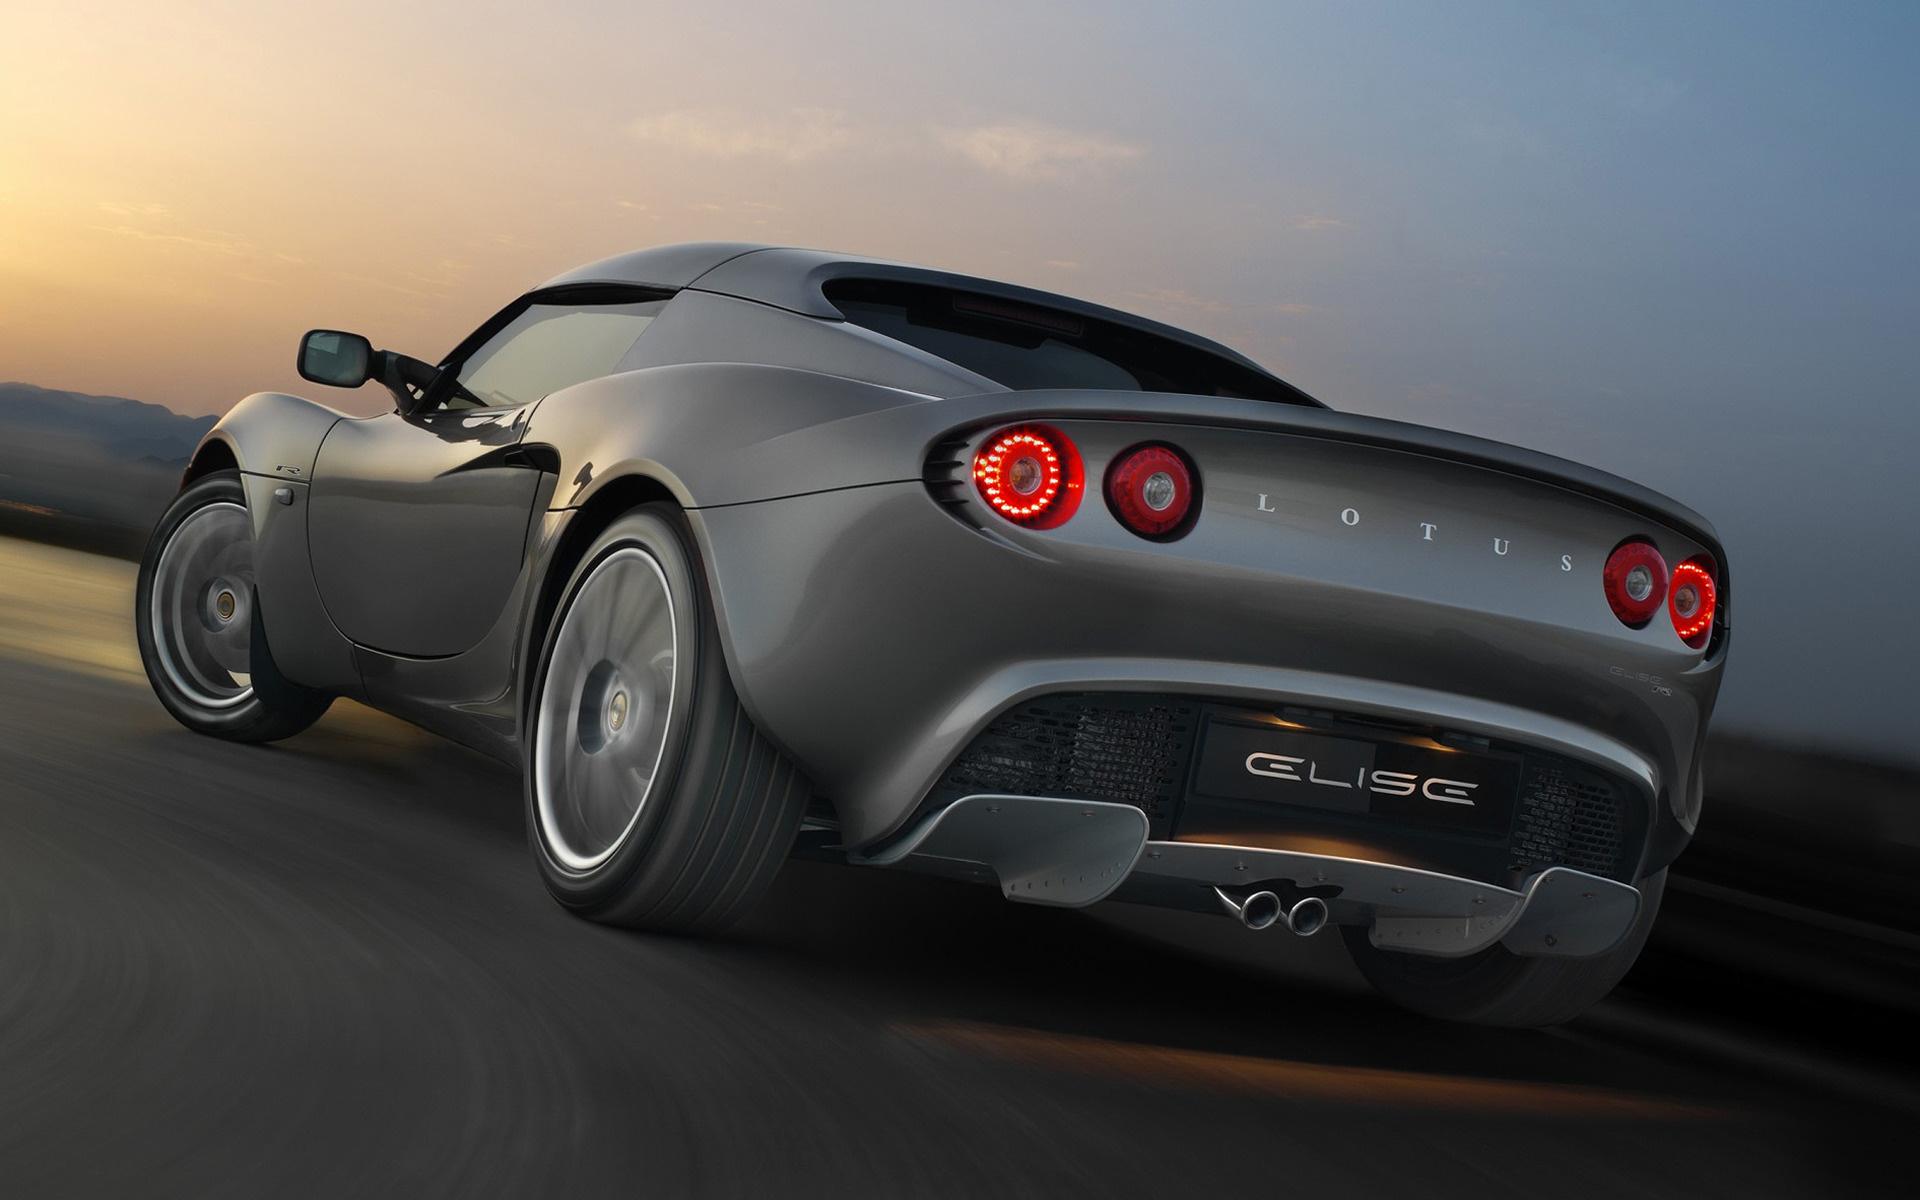 https://www.carpixel.net/w/16bf0560f7113118d9b813224a458938/lotus-elise-r-car-wallpaper-42112.jpg